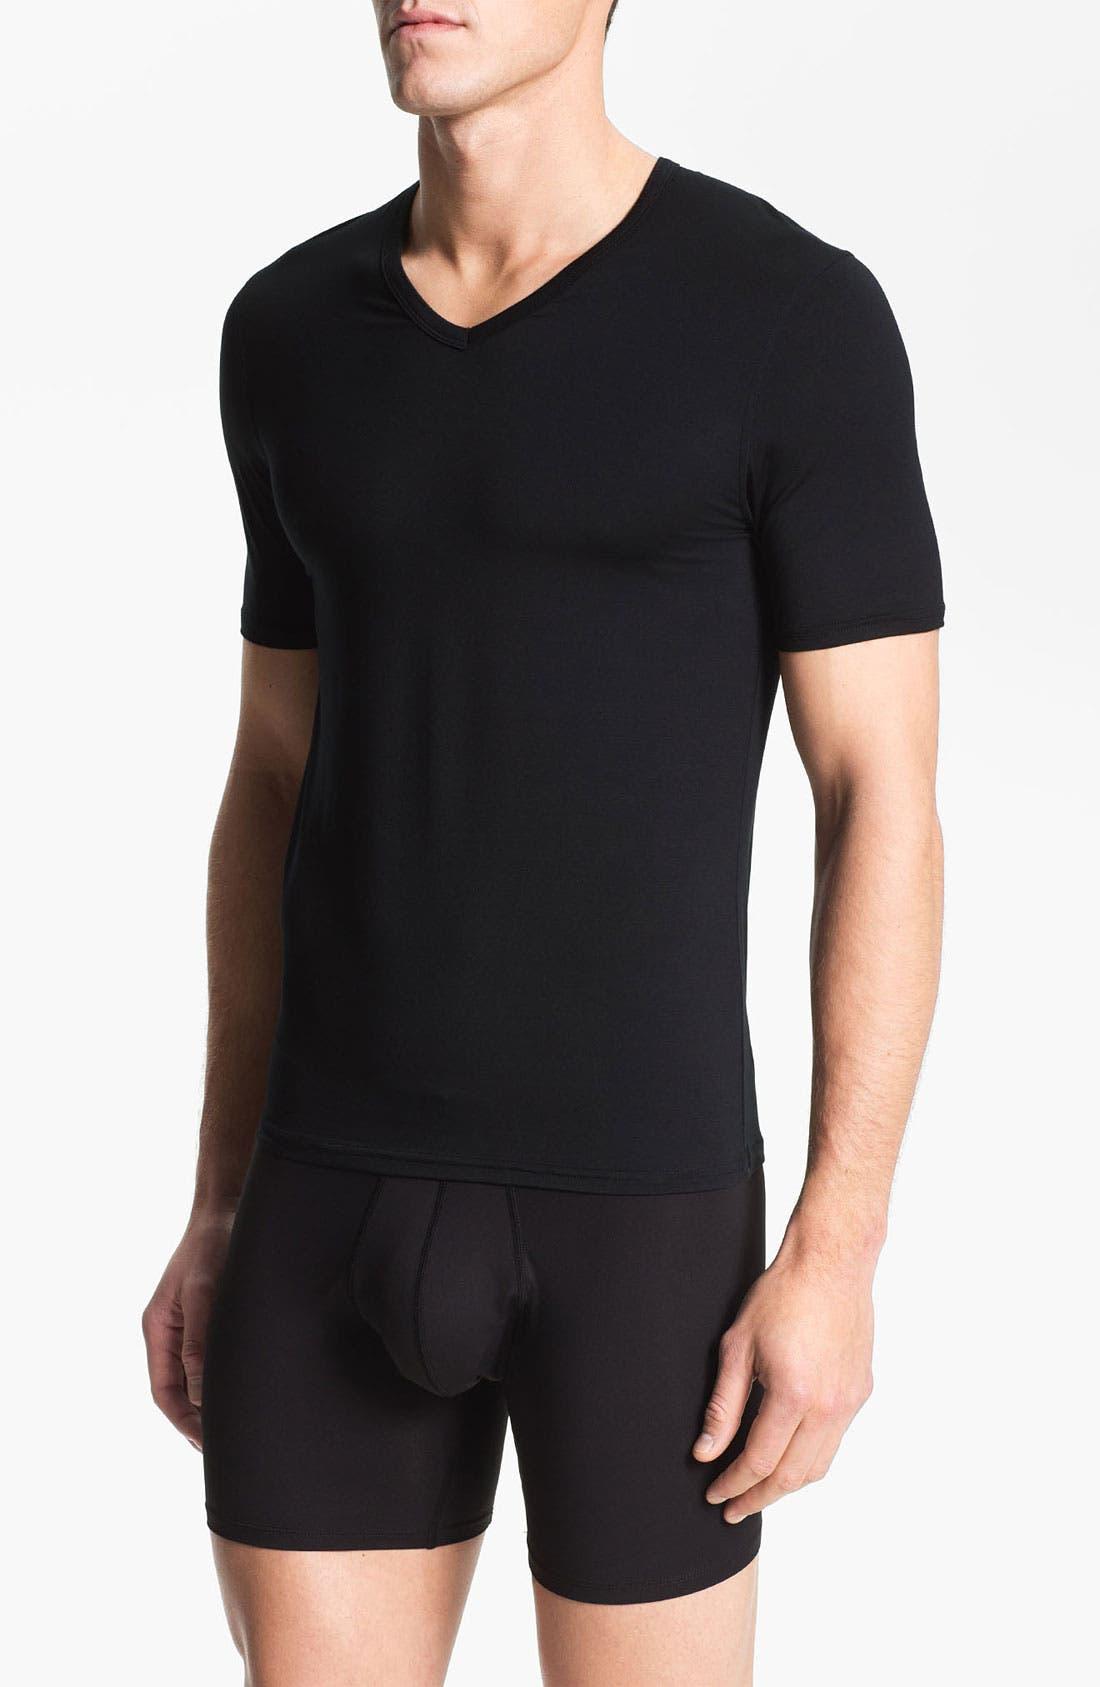 Alternate Image 1 Selected - Naked V-Neck Micromodal Undershirt